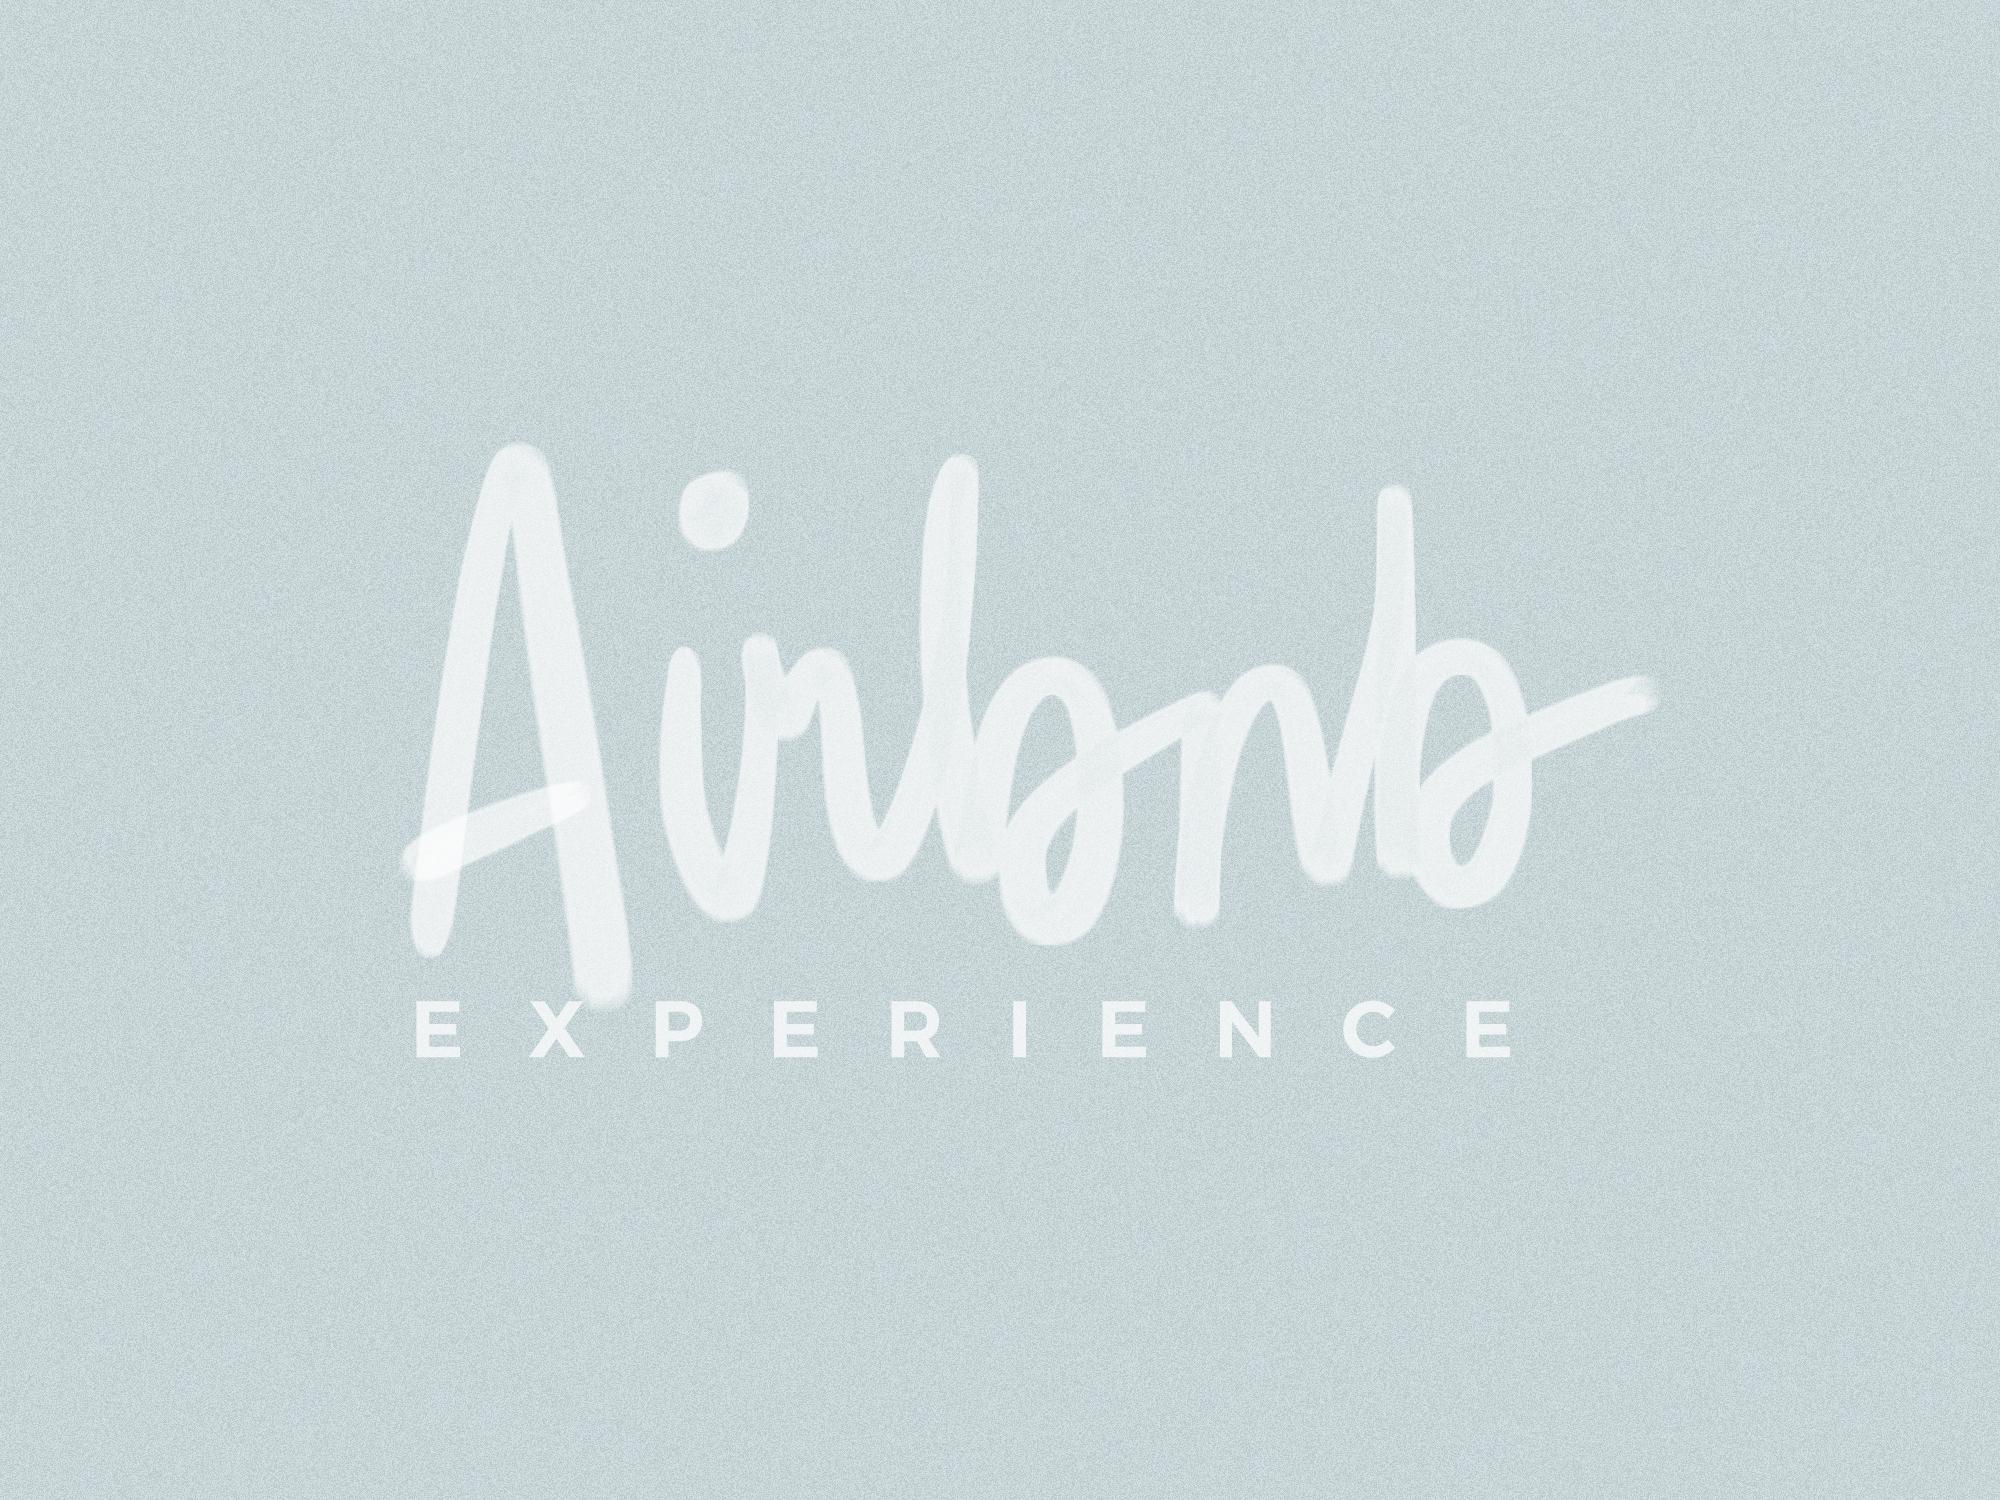 Airbnb Experience.jpg